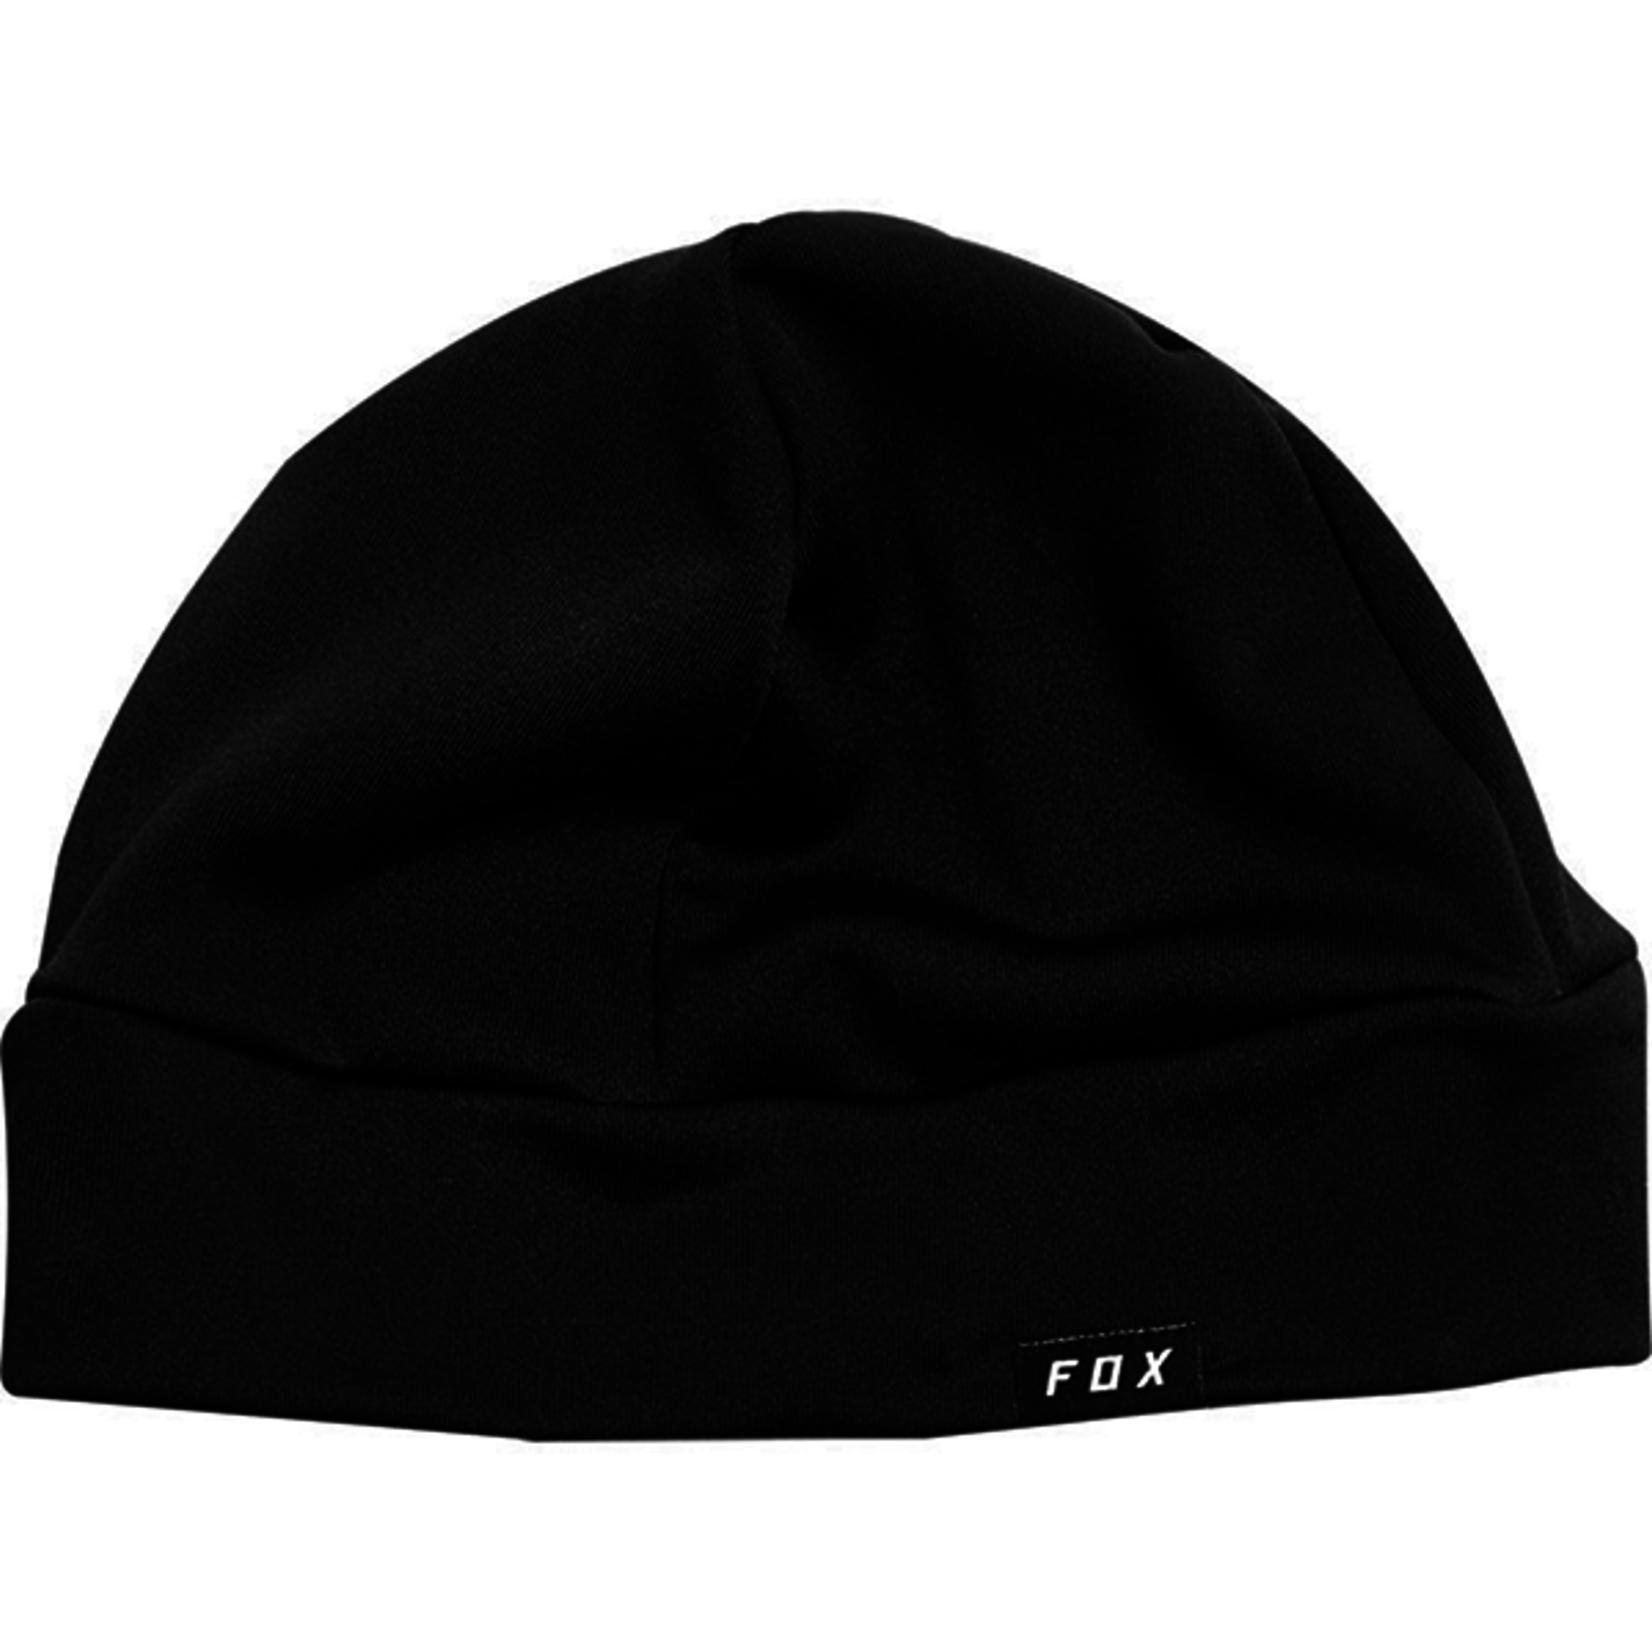 FOX POLARTEC   SKULL CAP  Black OS